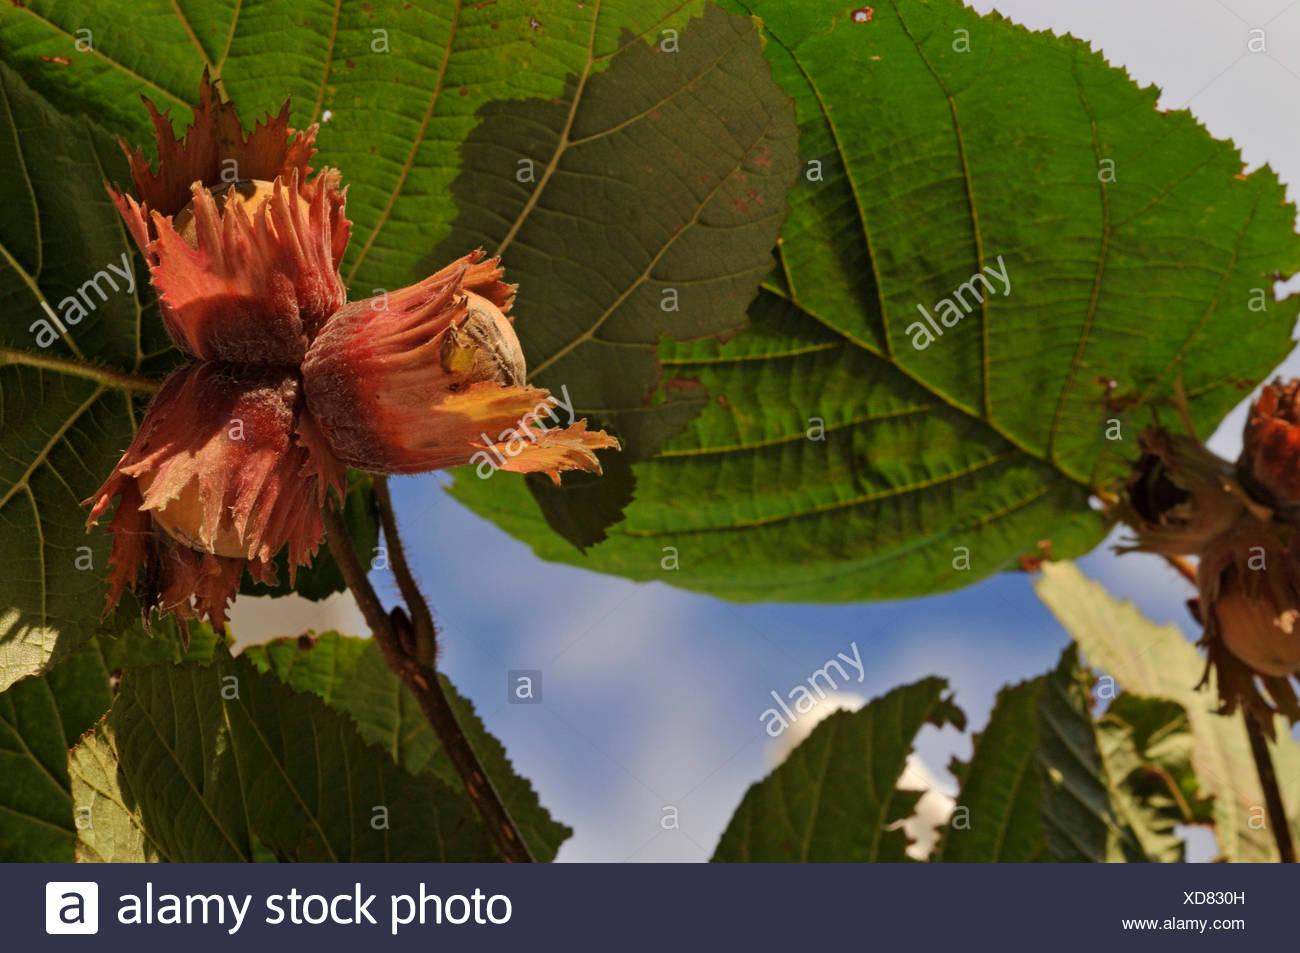 Giant hazel (Corylus maxima 'Purpurea', Corylus maxima Purpurea), branch with fruits - Stock Image